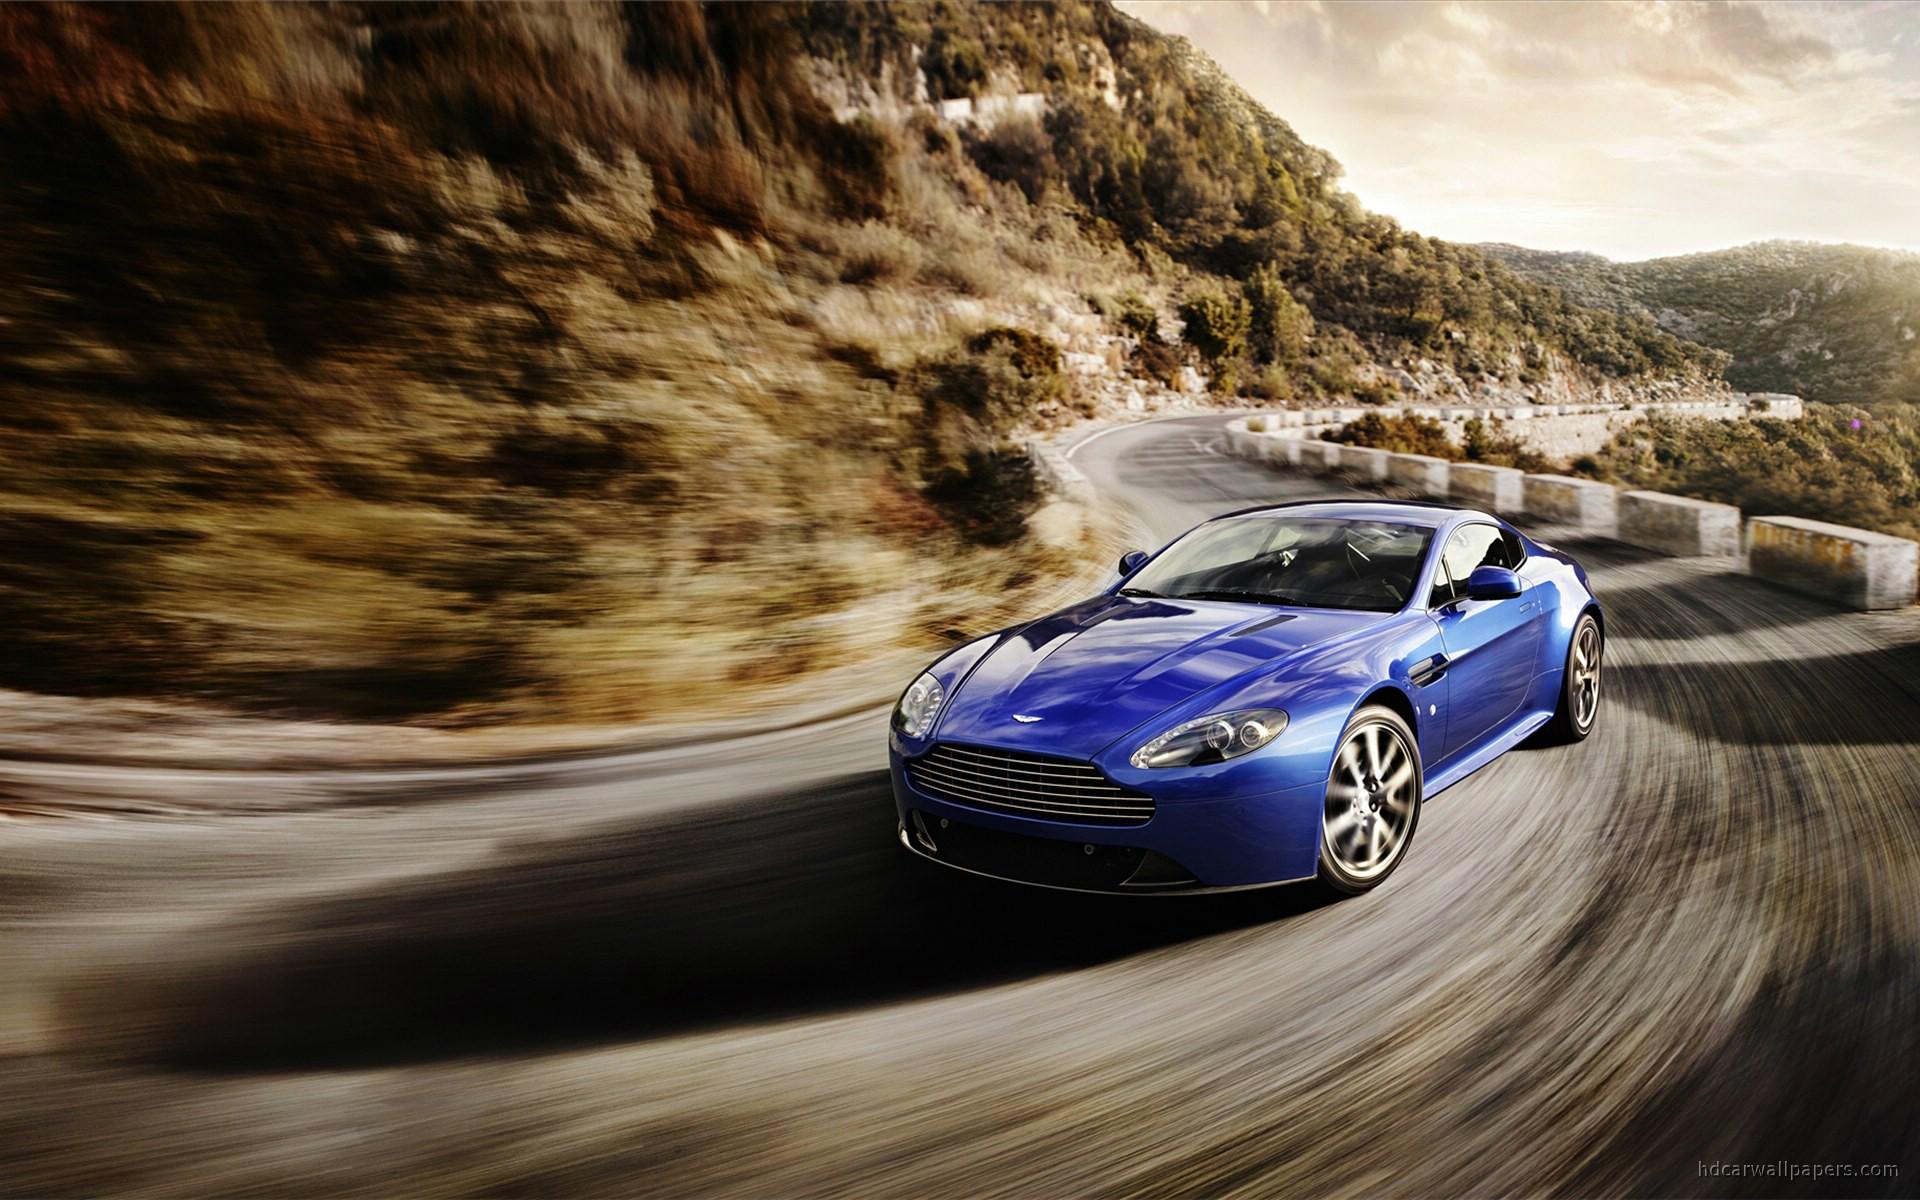 Aston Martin V8 Vantage Wallpapers and Background Images   stmednet 1920x1200